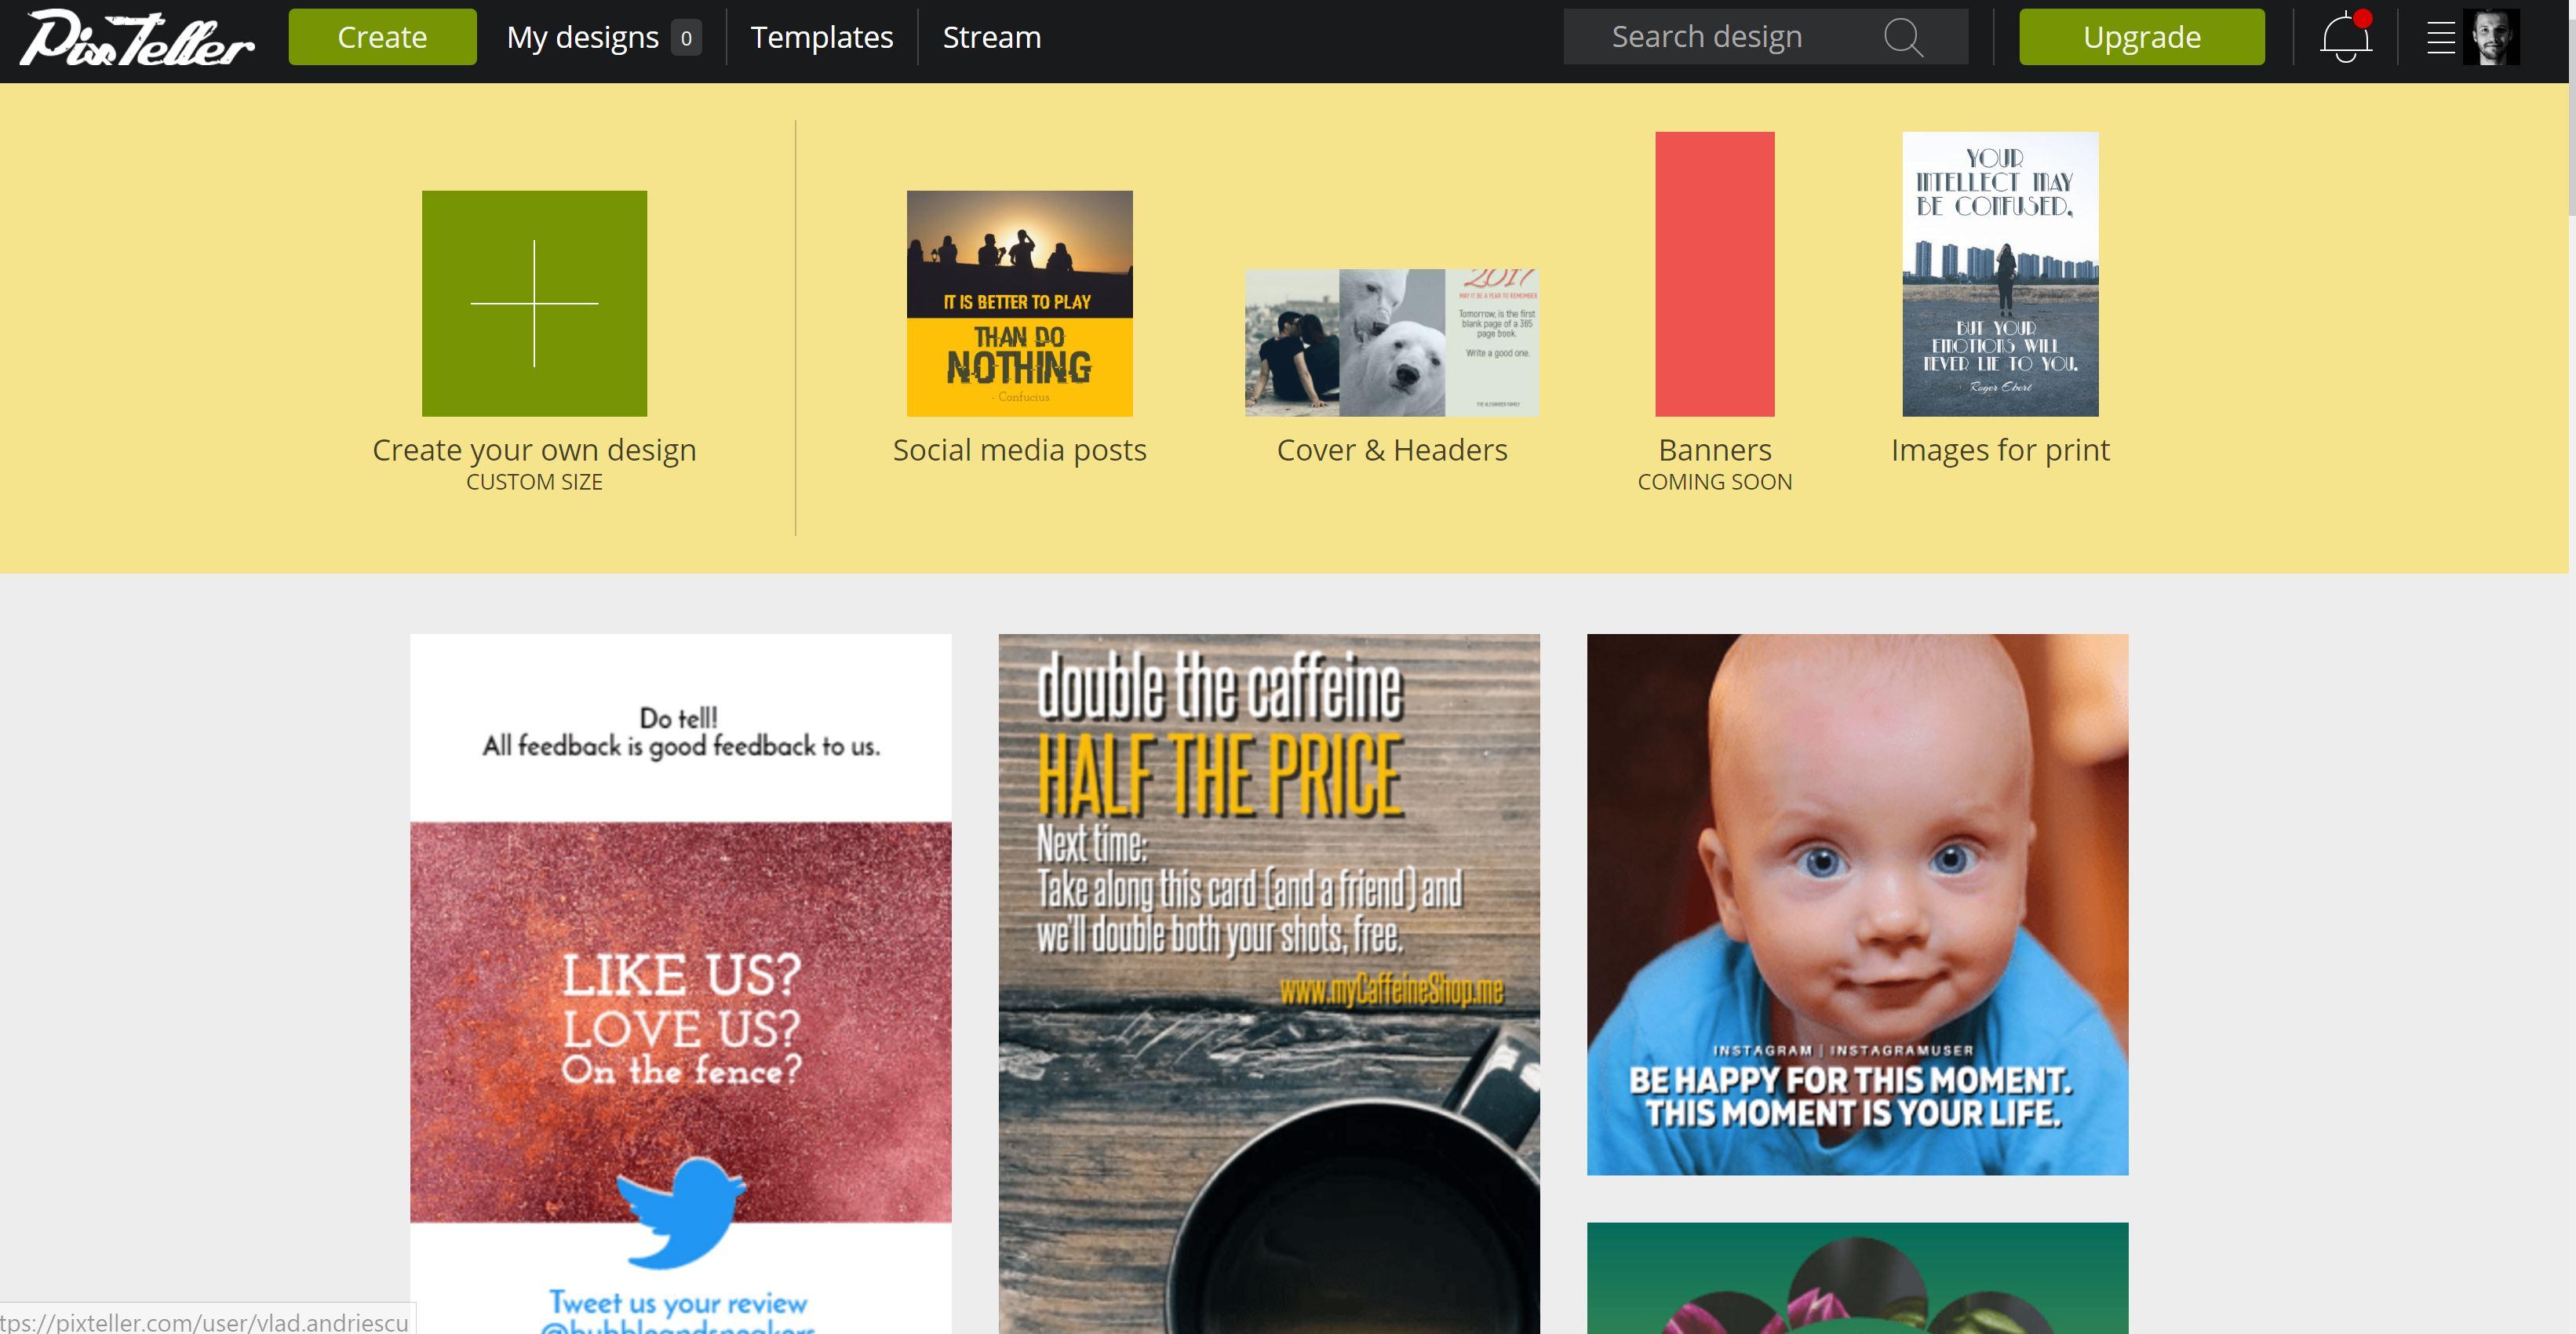 pixteller alexandru roznovat design template internet